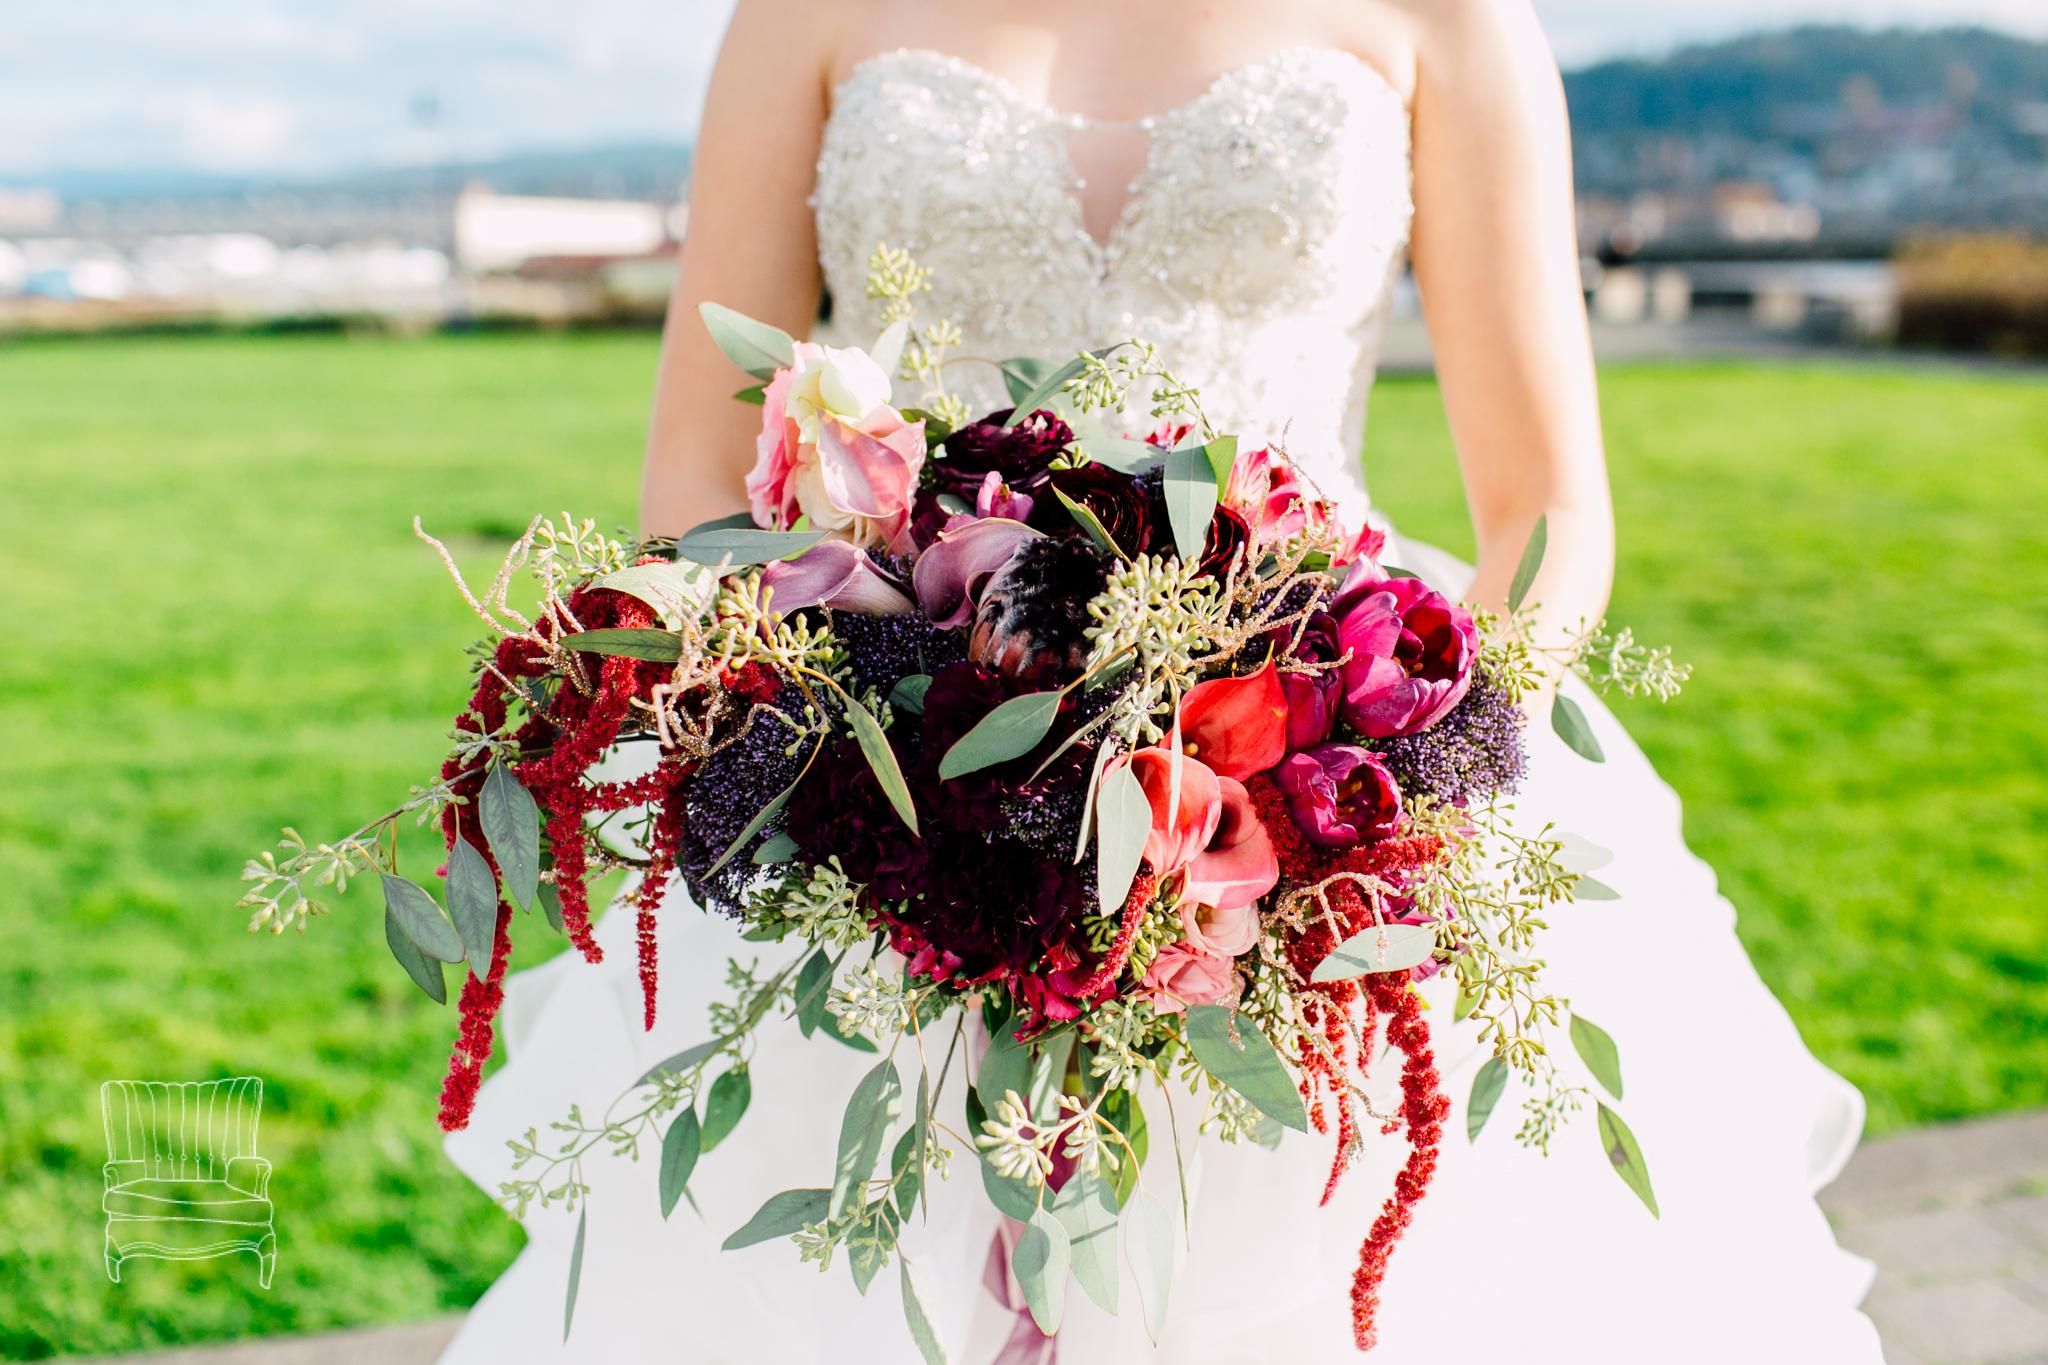 bellwether-hotel-bellingham-wedding-photographer-katheryn-moran-glitz-glam-styled-393.jpg